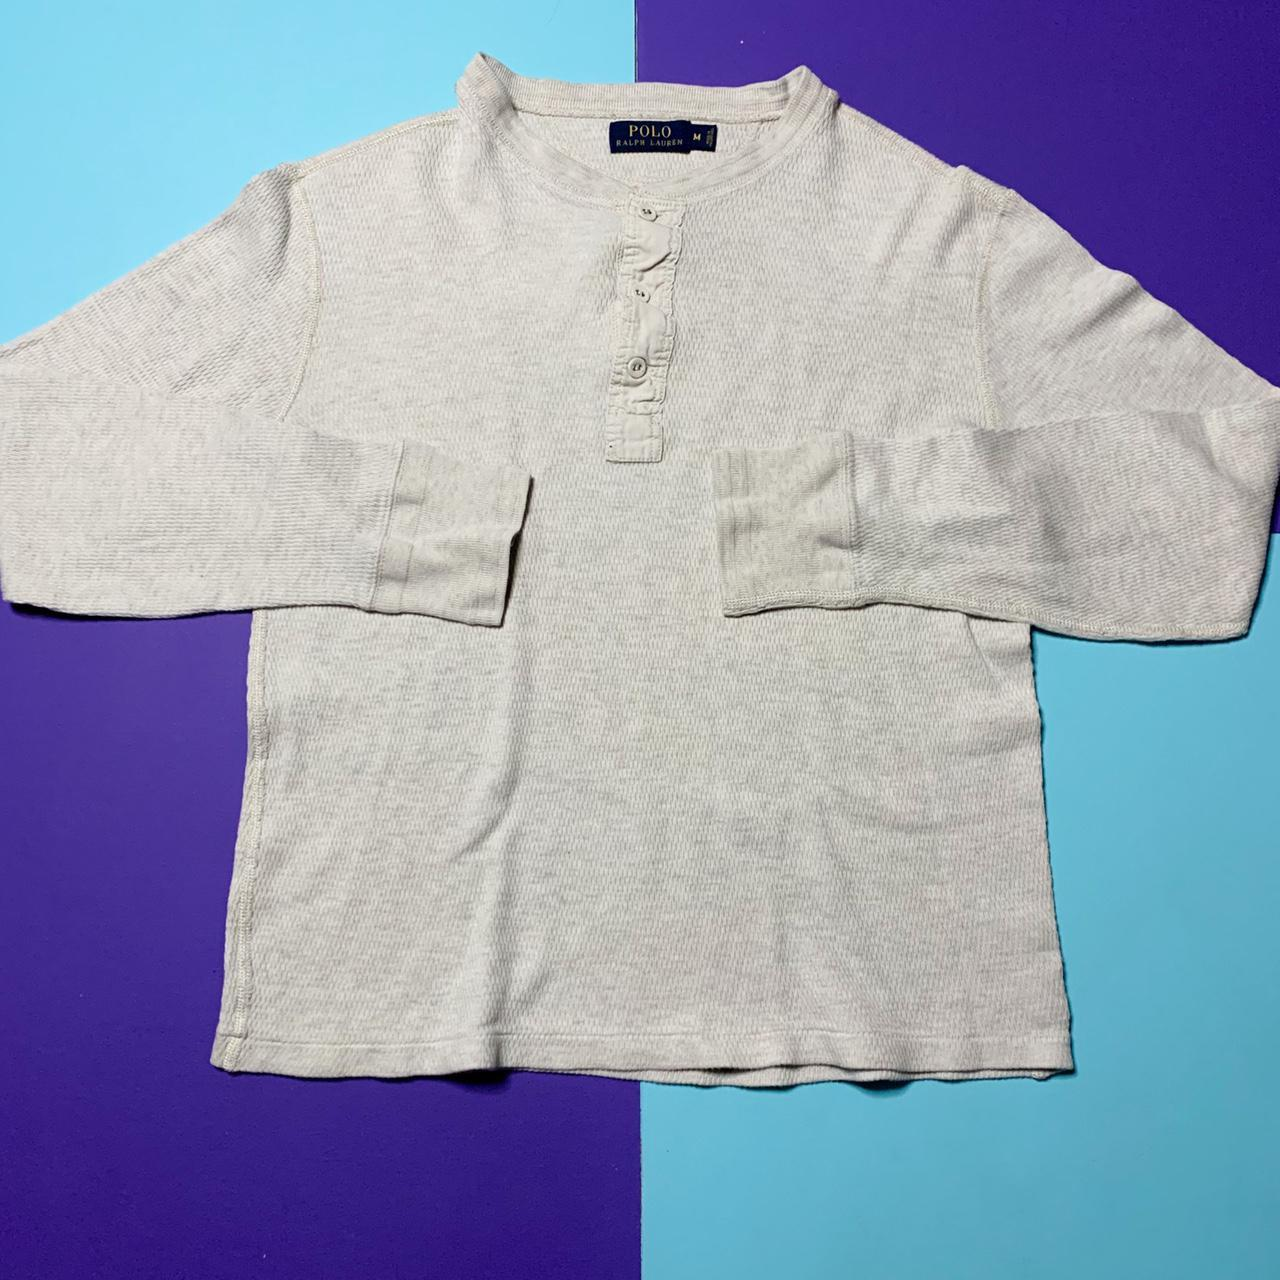 Product Image 1 - Polo Ralph Lauren Shirt   -